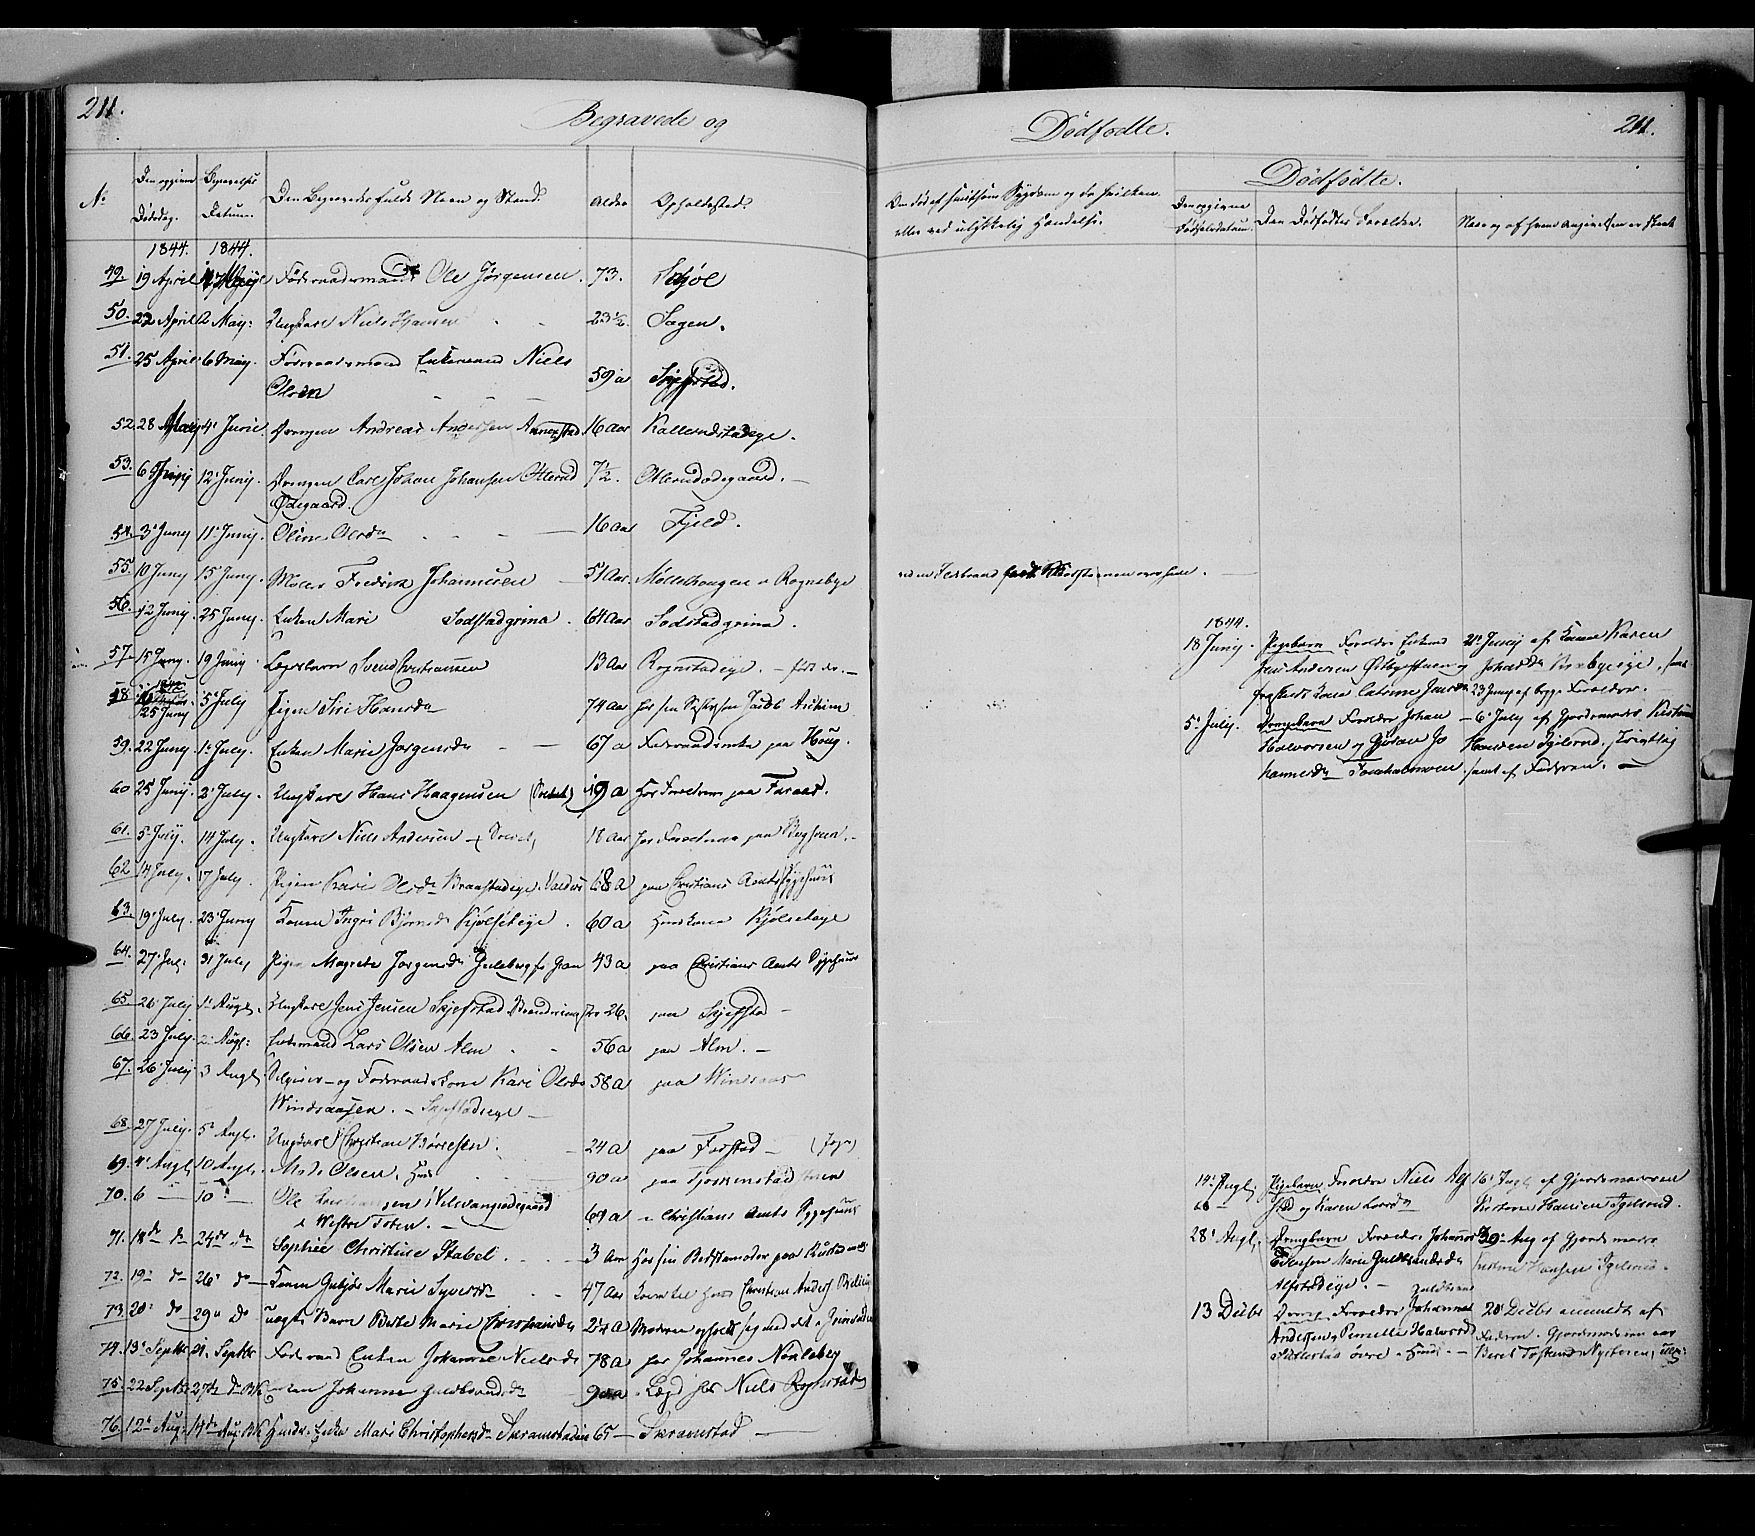 SAH, Østre Toten prestekontor, Ministerialbok nr. 2, 1840-1847, s. 211